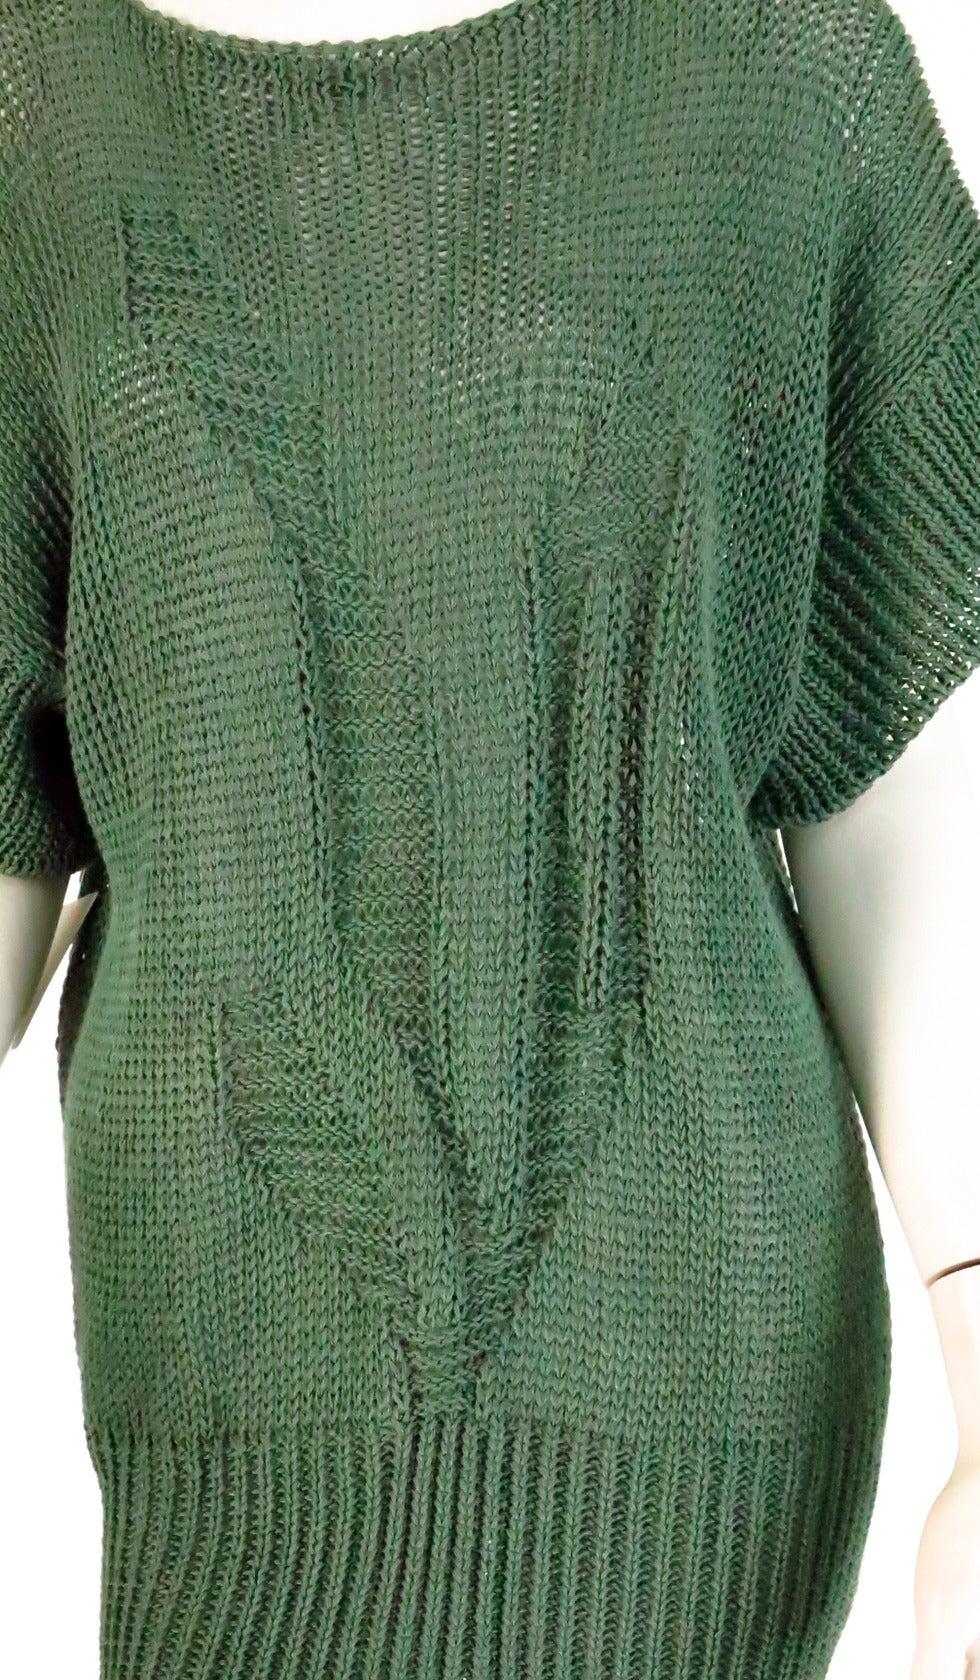 1980s Jil Sander pine green sweater knit tunic 8